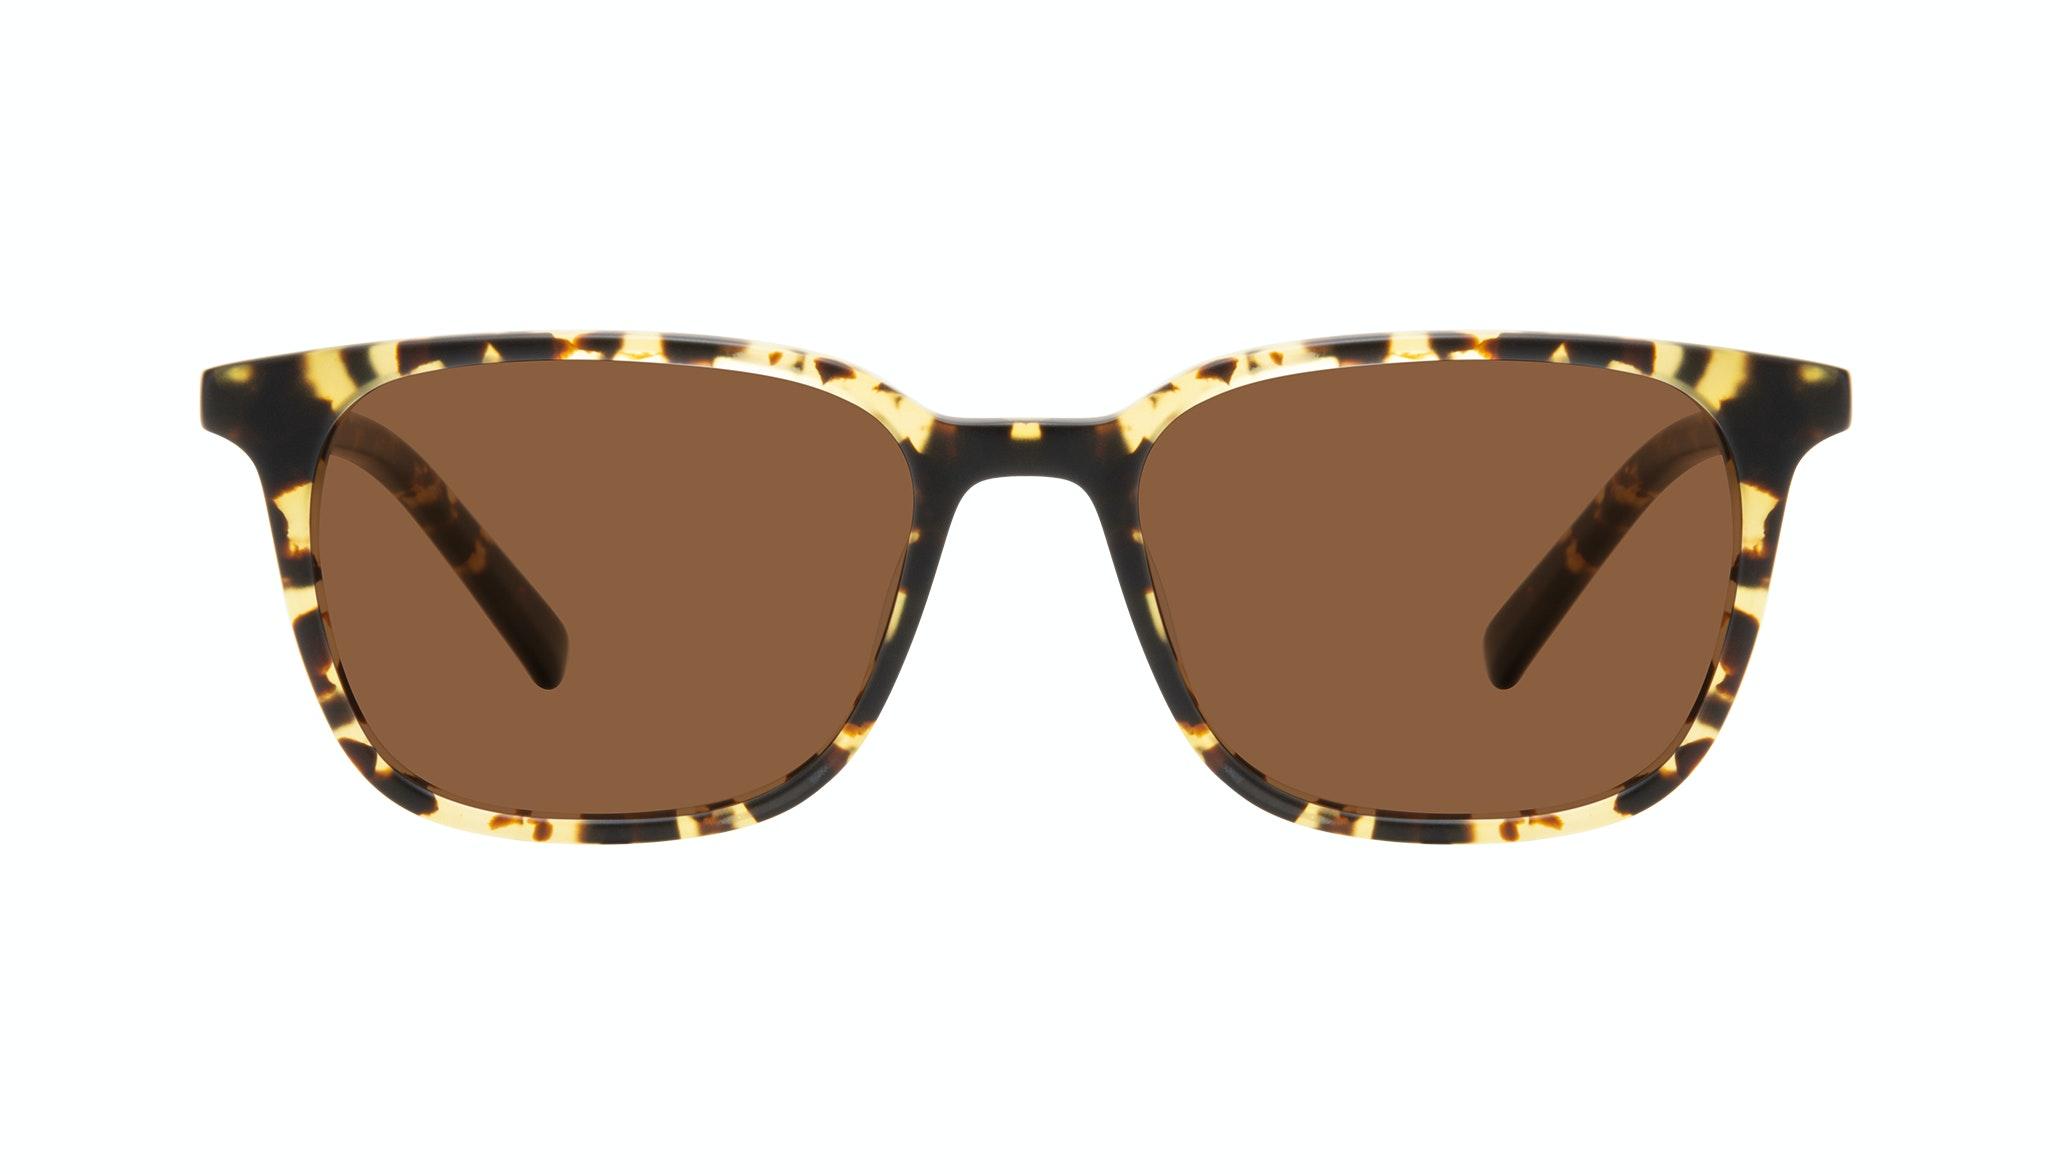 Affordable Fashion Glasses Square Sunglasses Men Choice Tortoise Matte Front